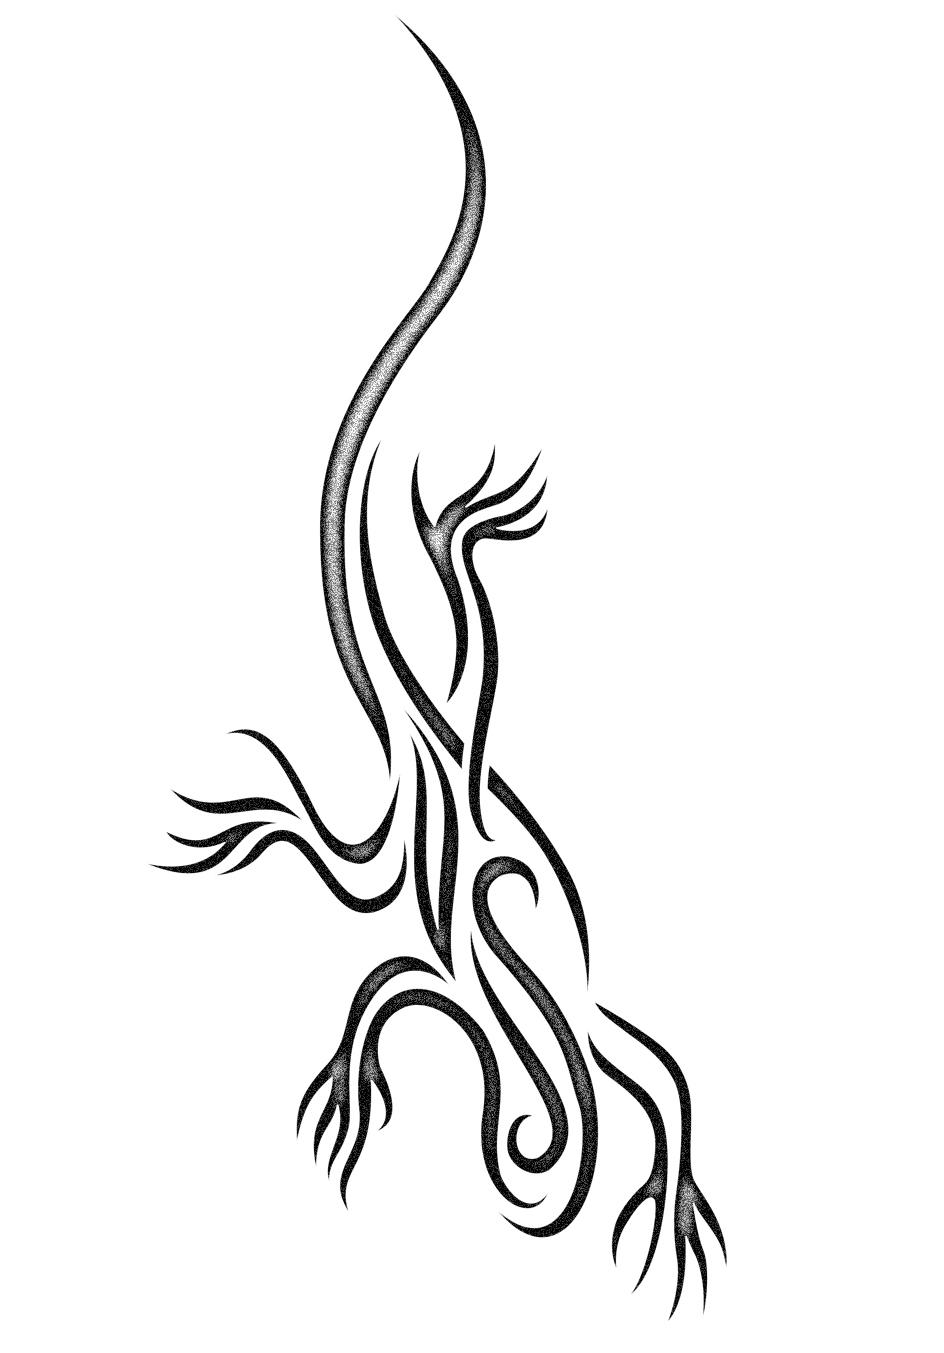 lizard tattoo design by phoebus chango on deviantart. Black Bedroom Furniture Sets. Home Design Ideas